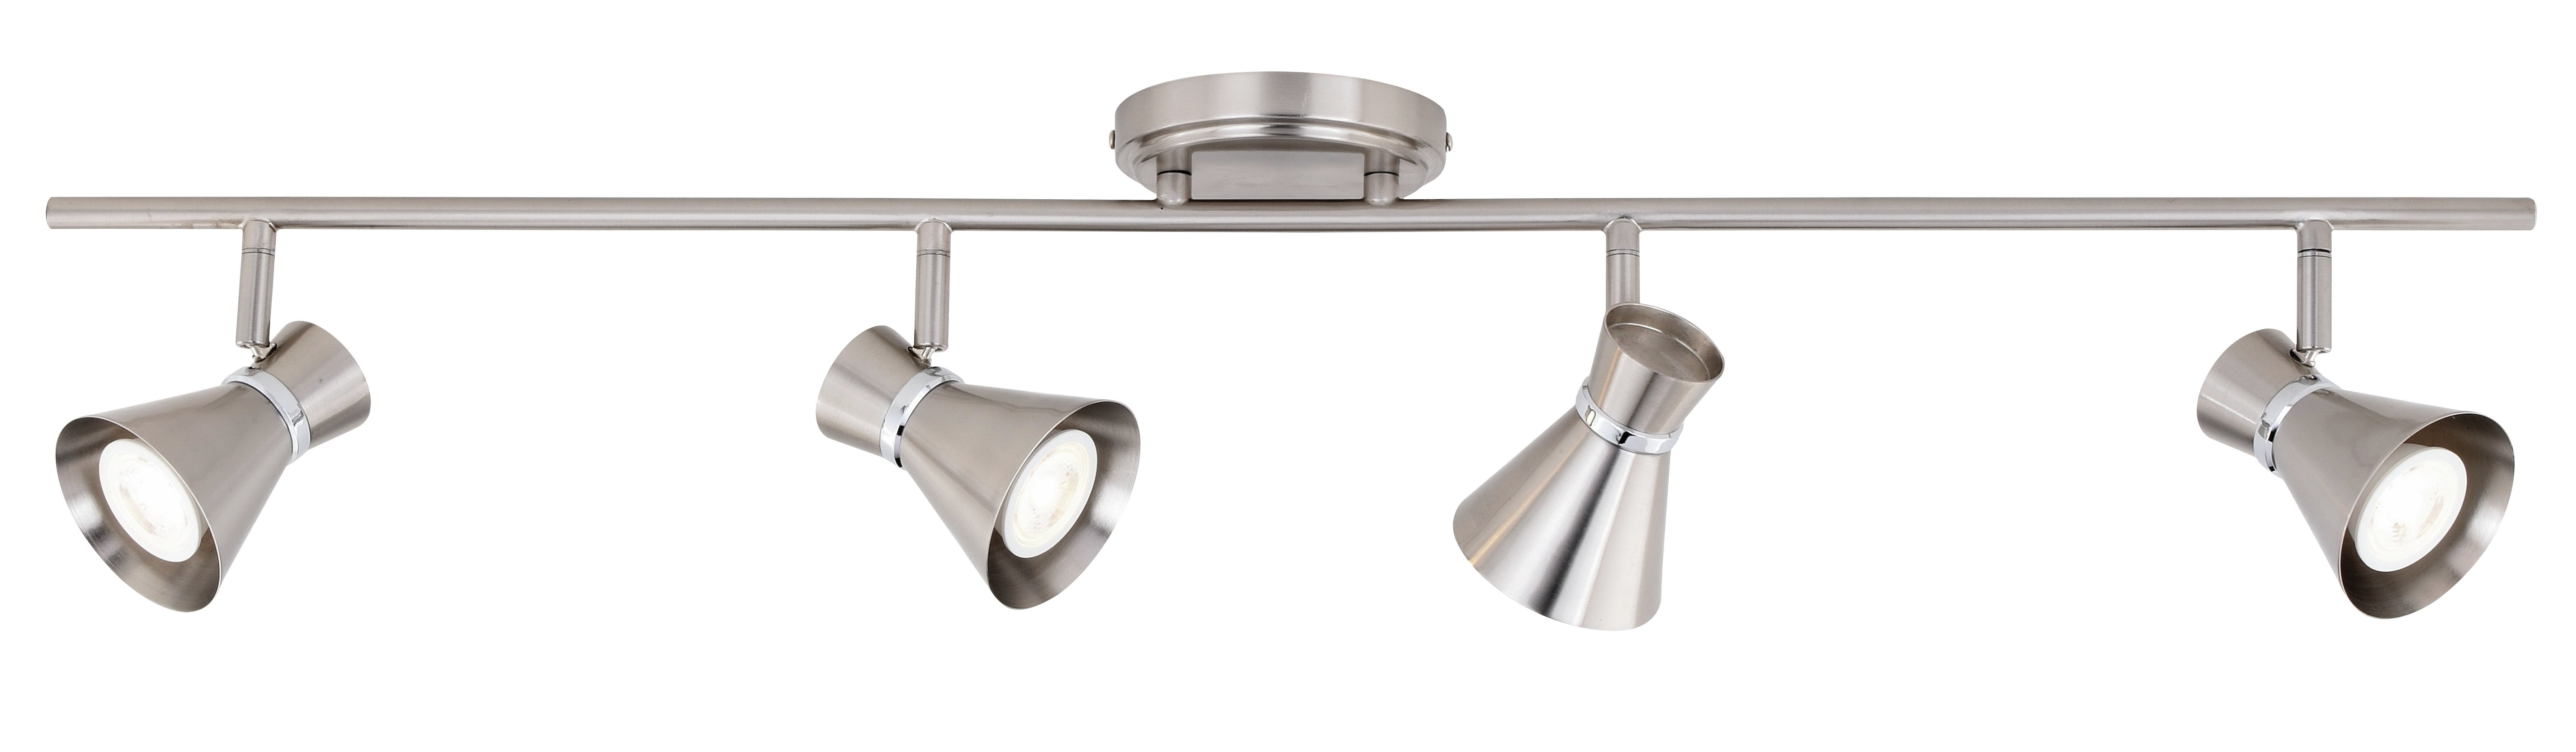 Modern Contemporary Orren Ellis Track Lighting Kits You Ll Love In 2021 Wayfair